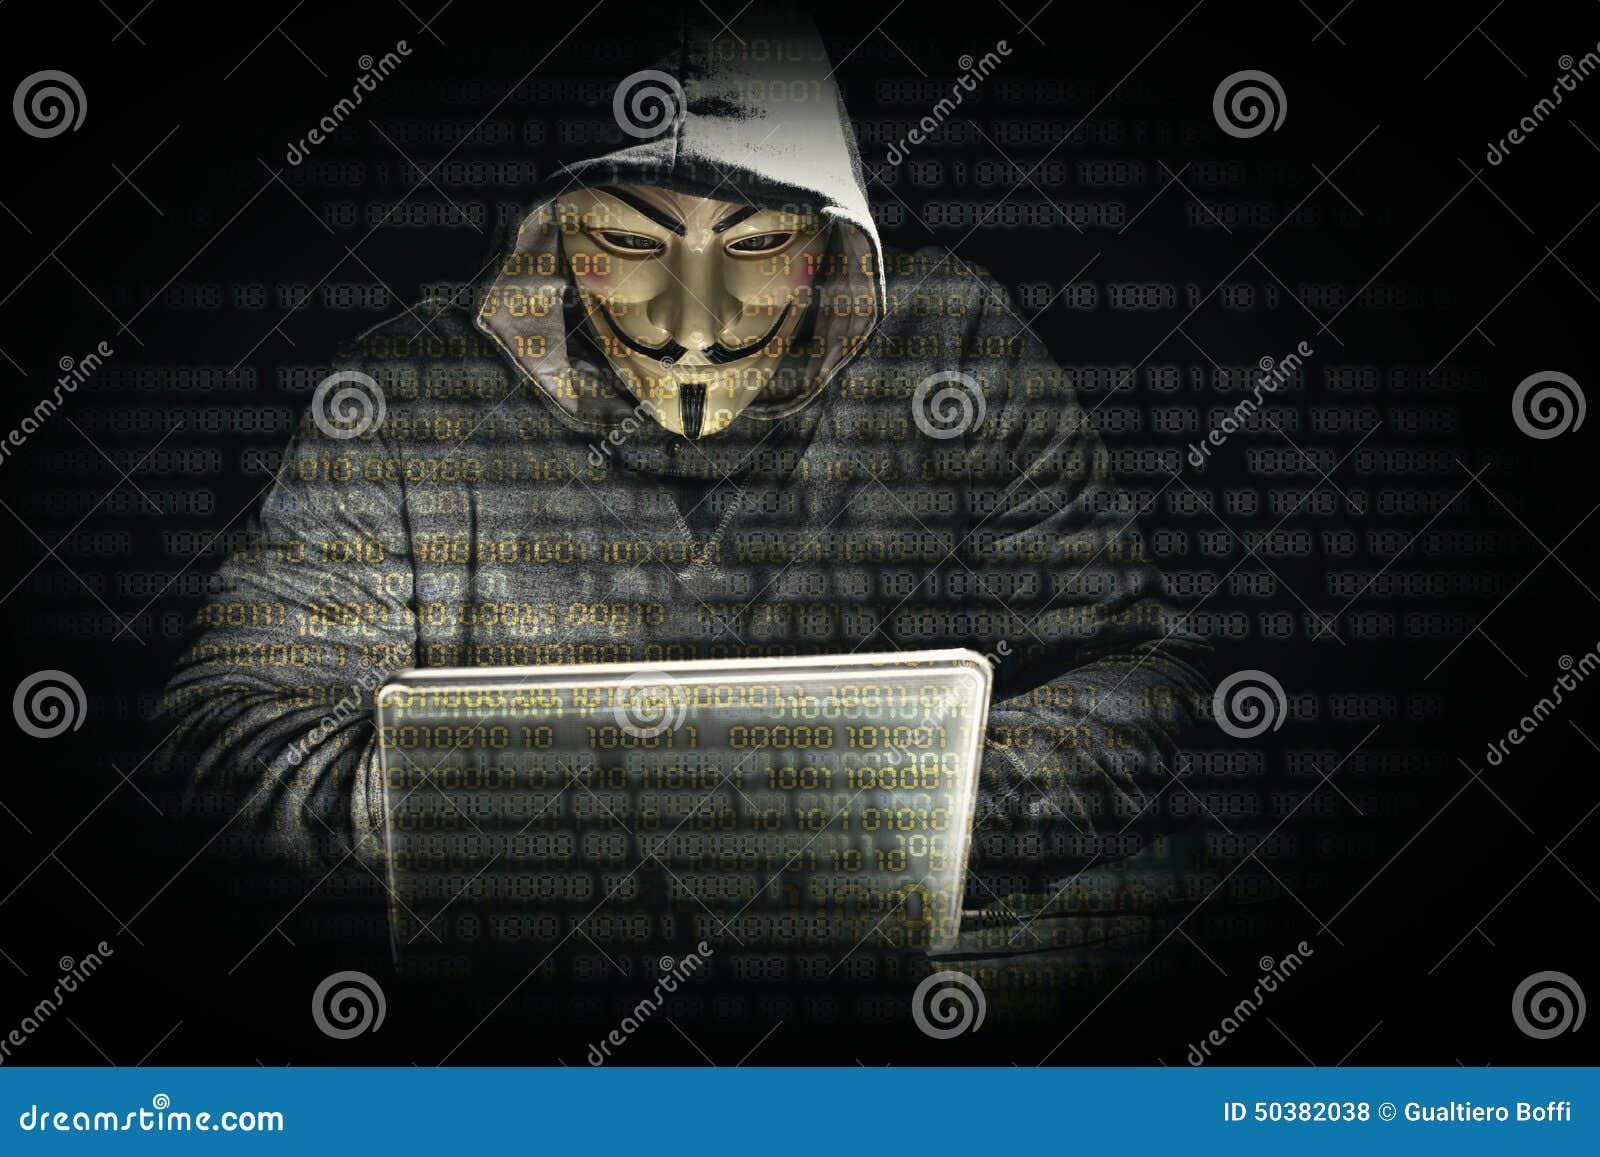 Hackers In Watch Dogs